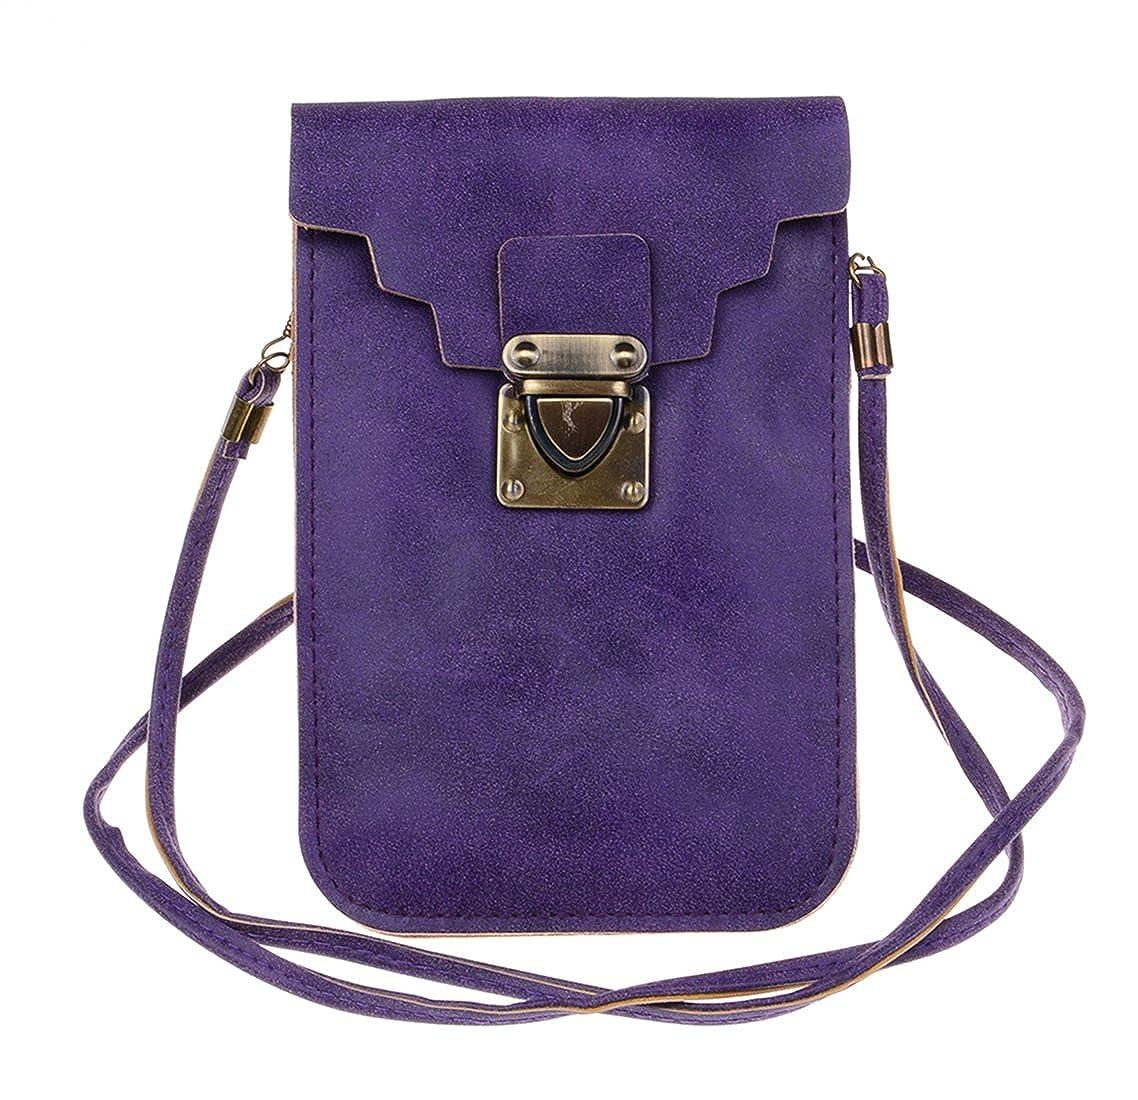 Model C-purple